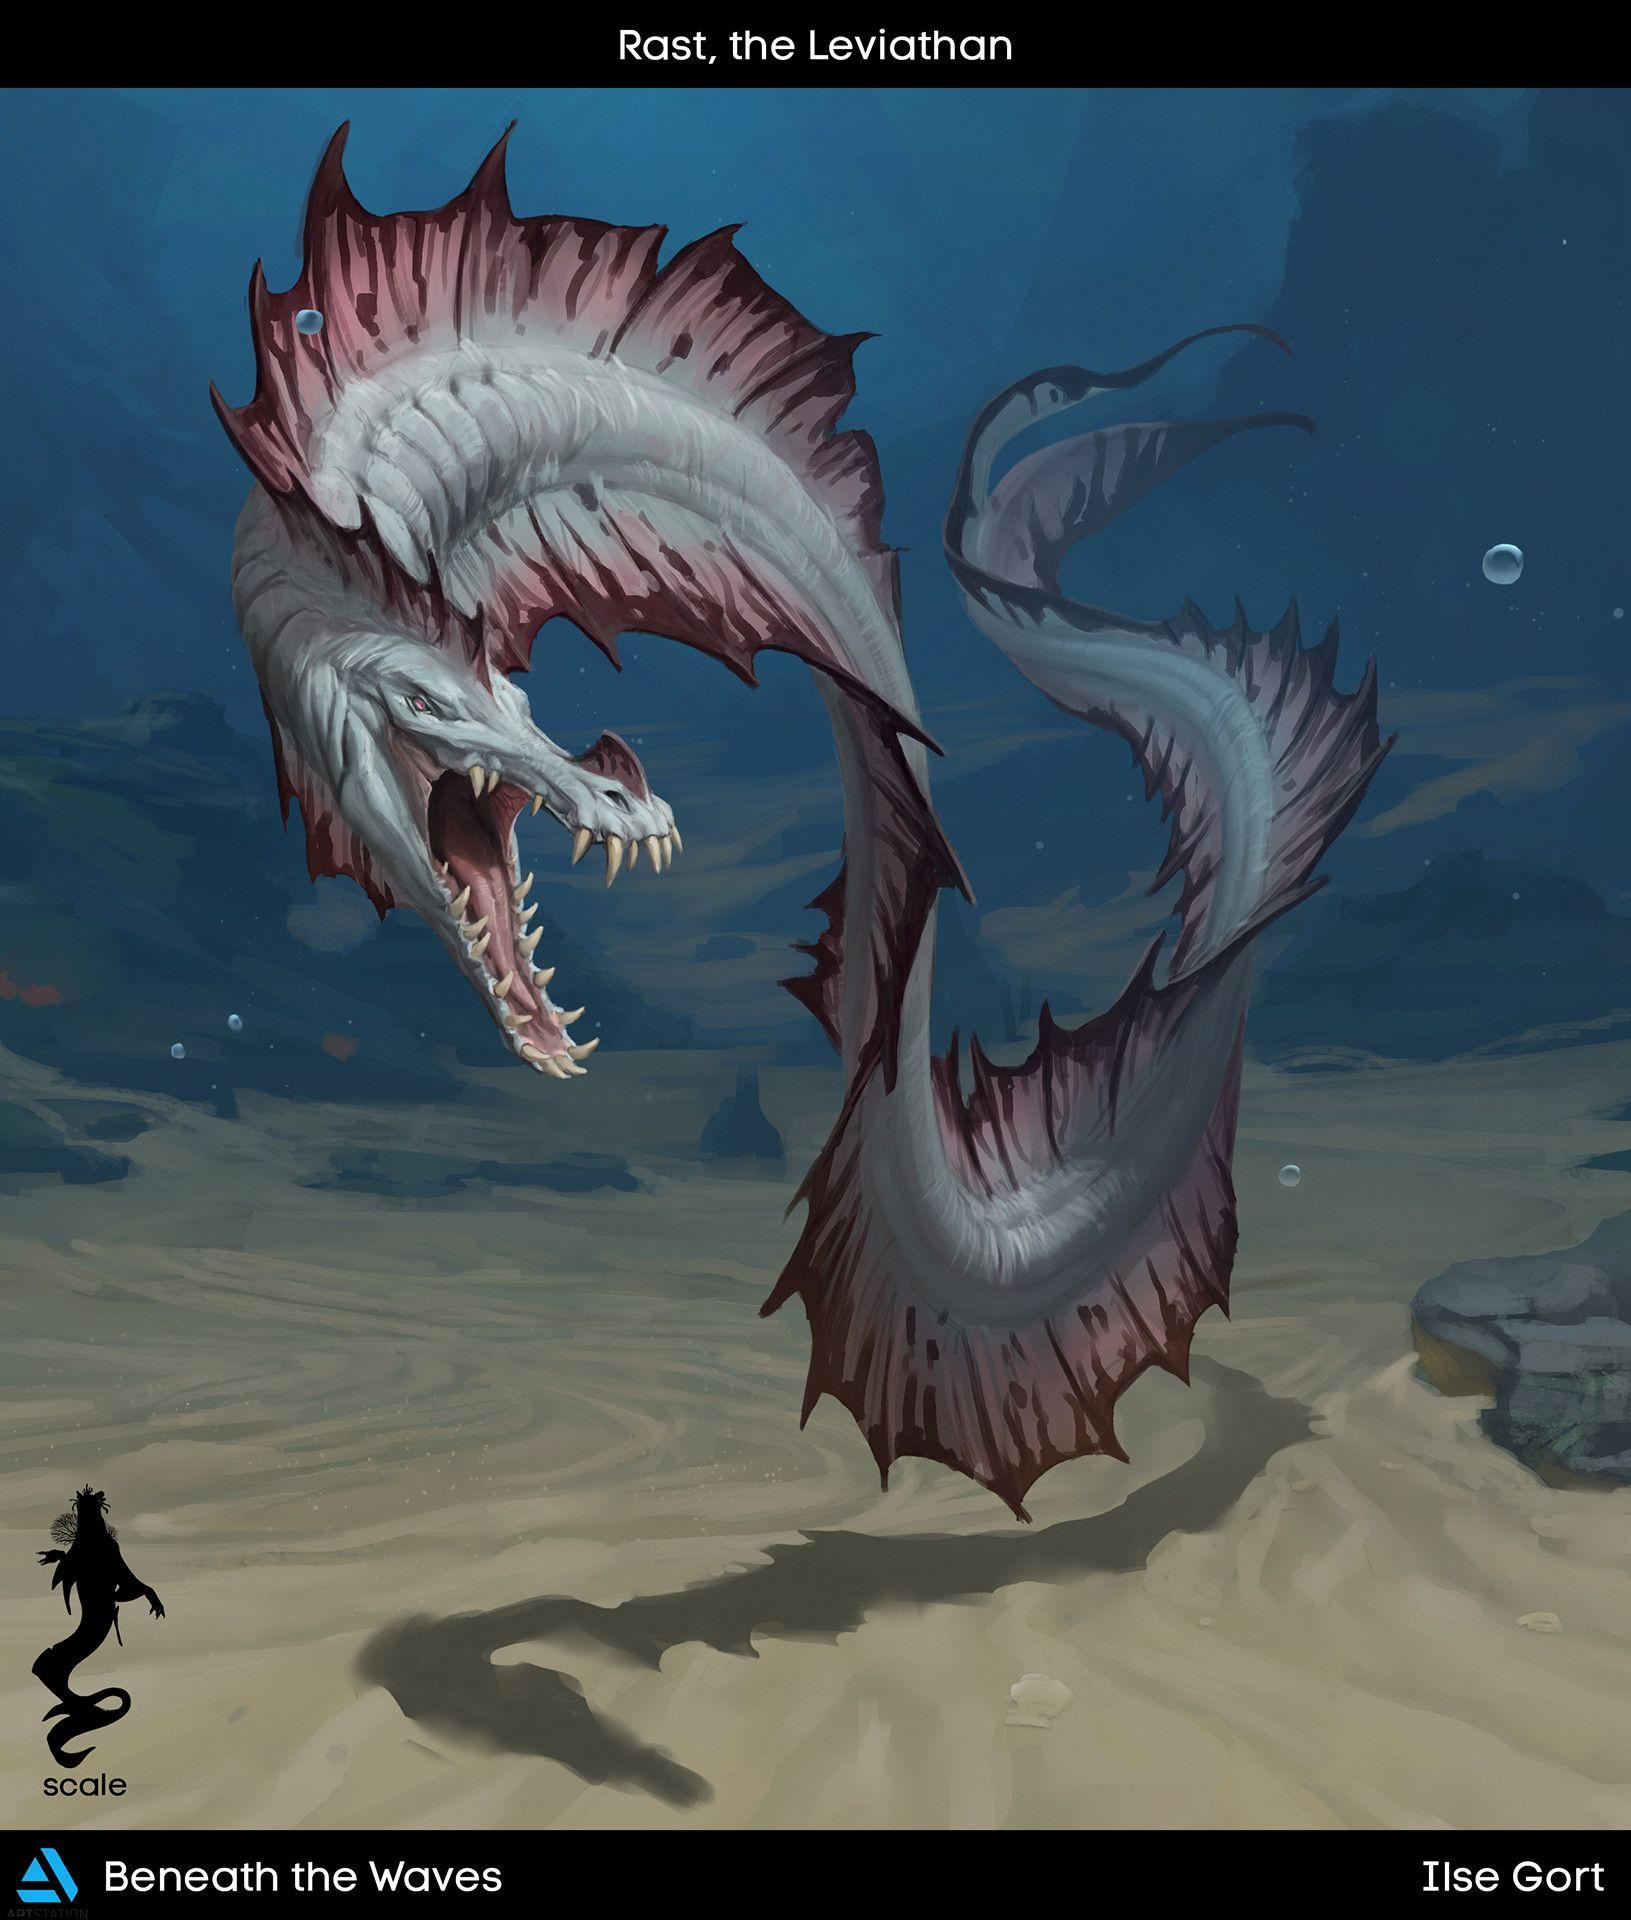 ArtStation - Beneath the Waves: Creatures, Ilse Gort | Sea ...